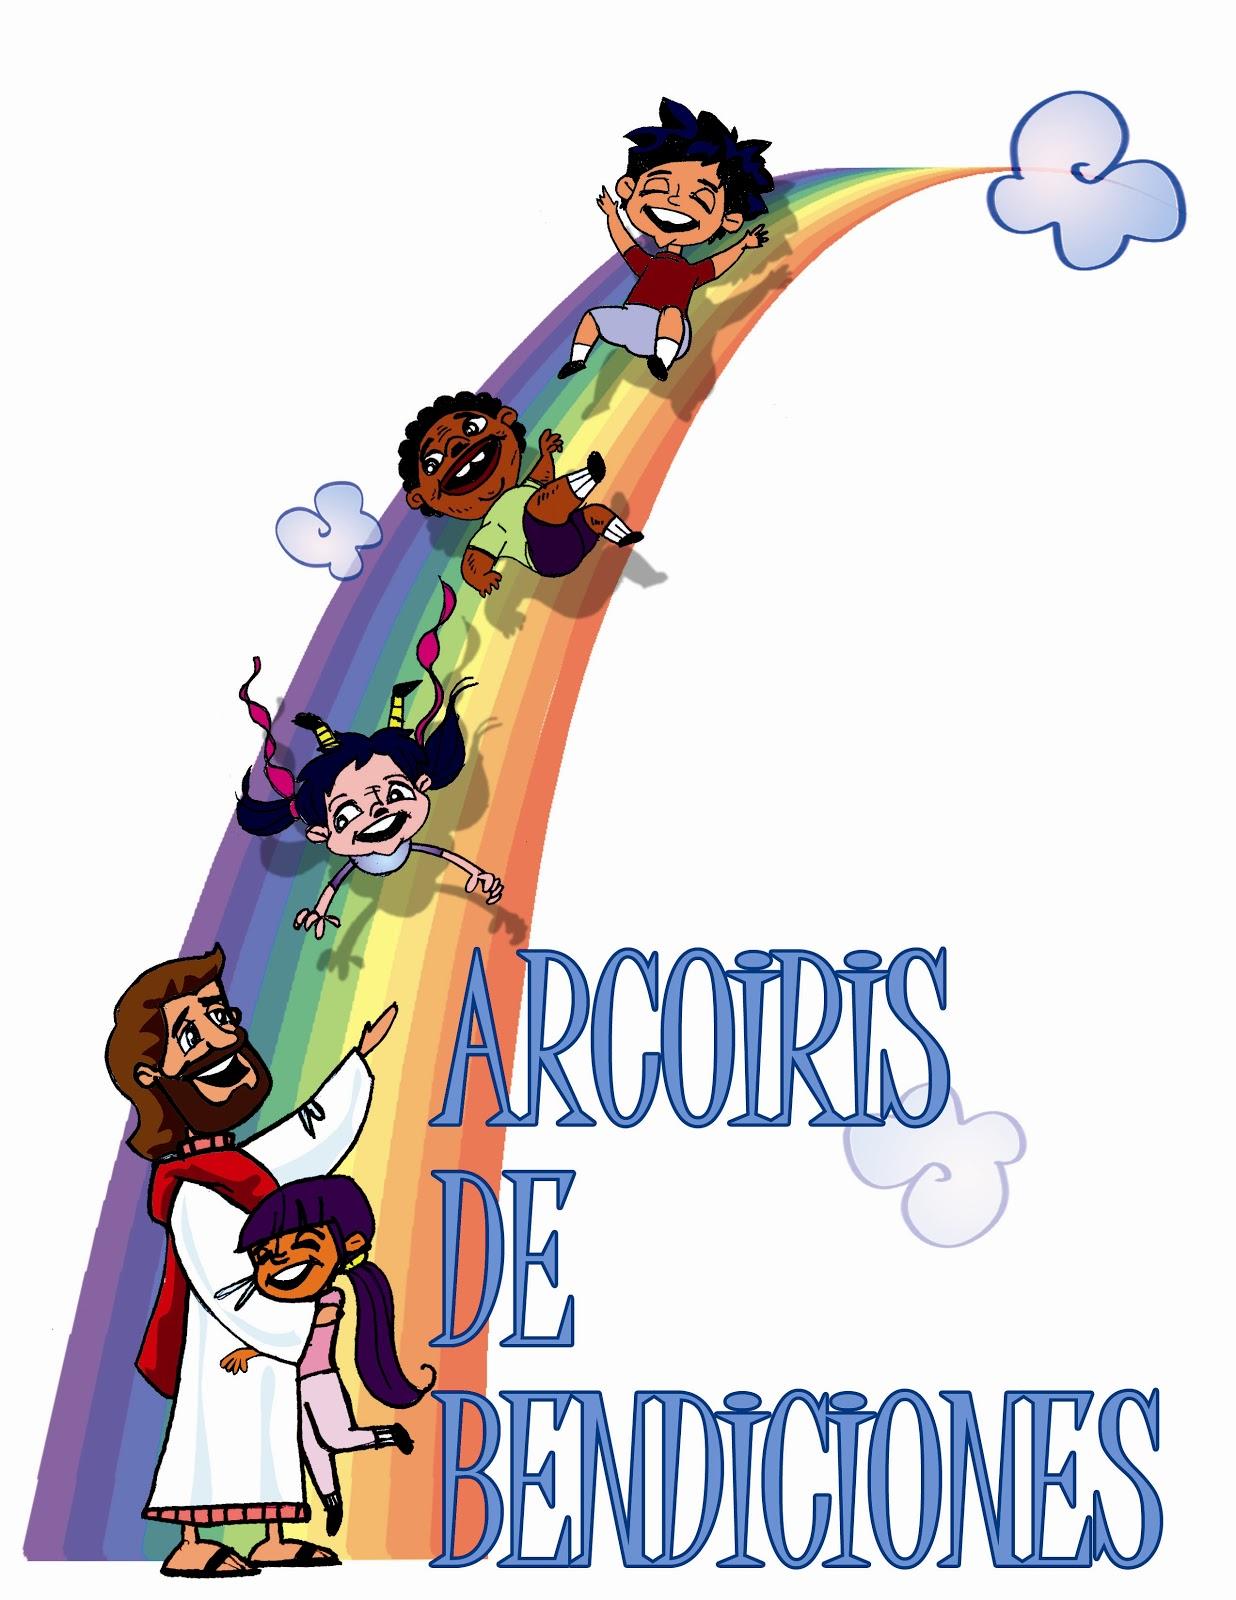 Dramas Infantiles Cristianos Cortos | MEJOR CONJUNTO DE FRASES